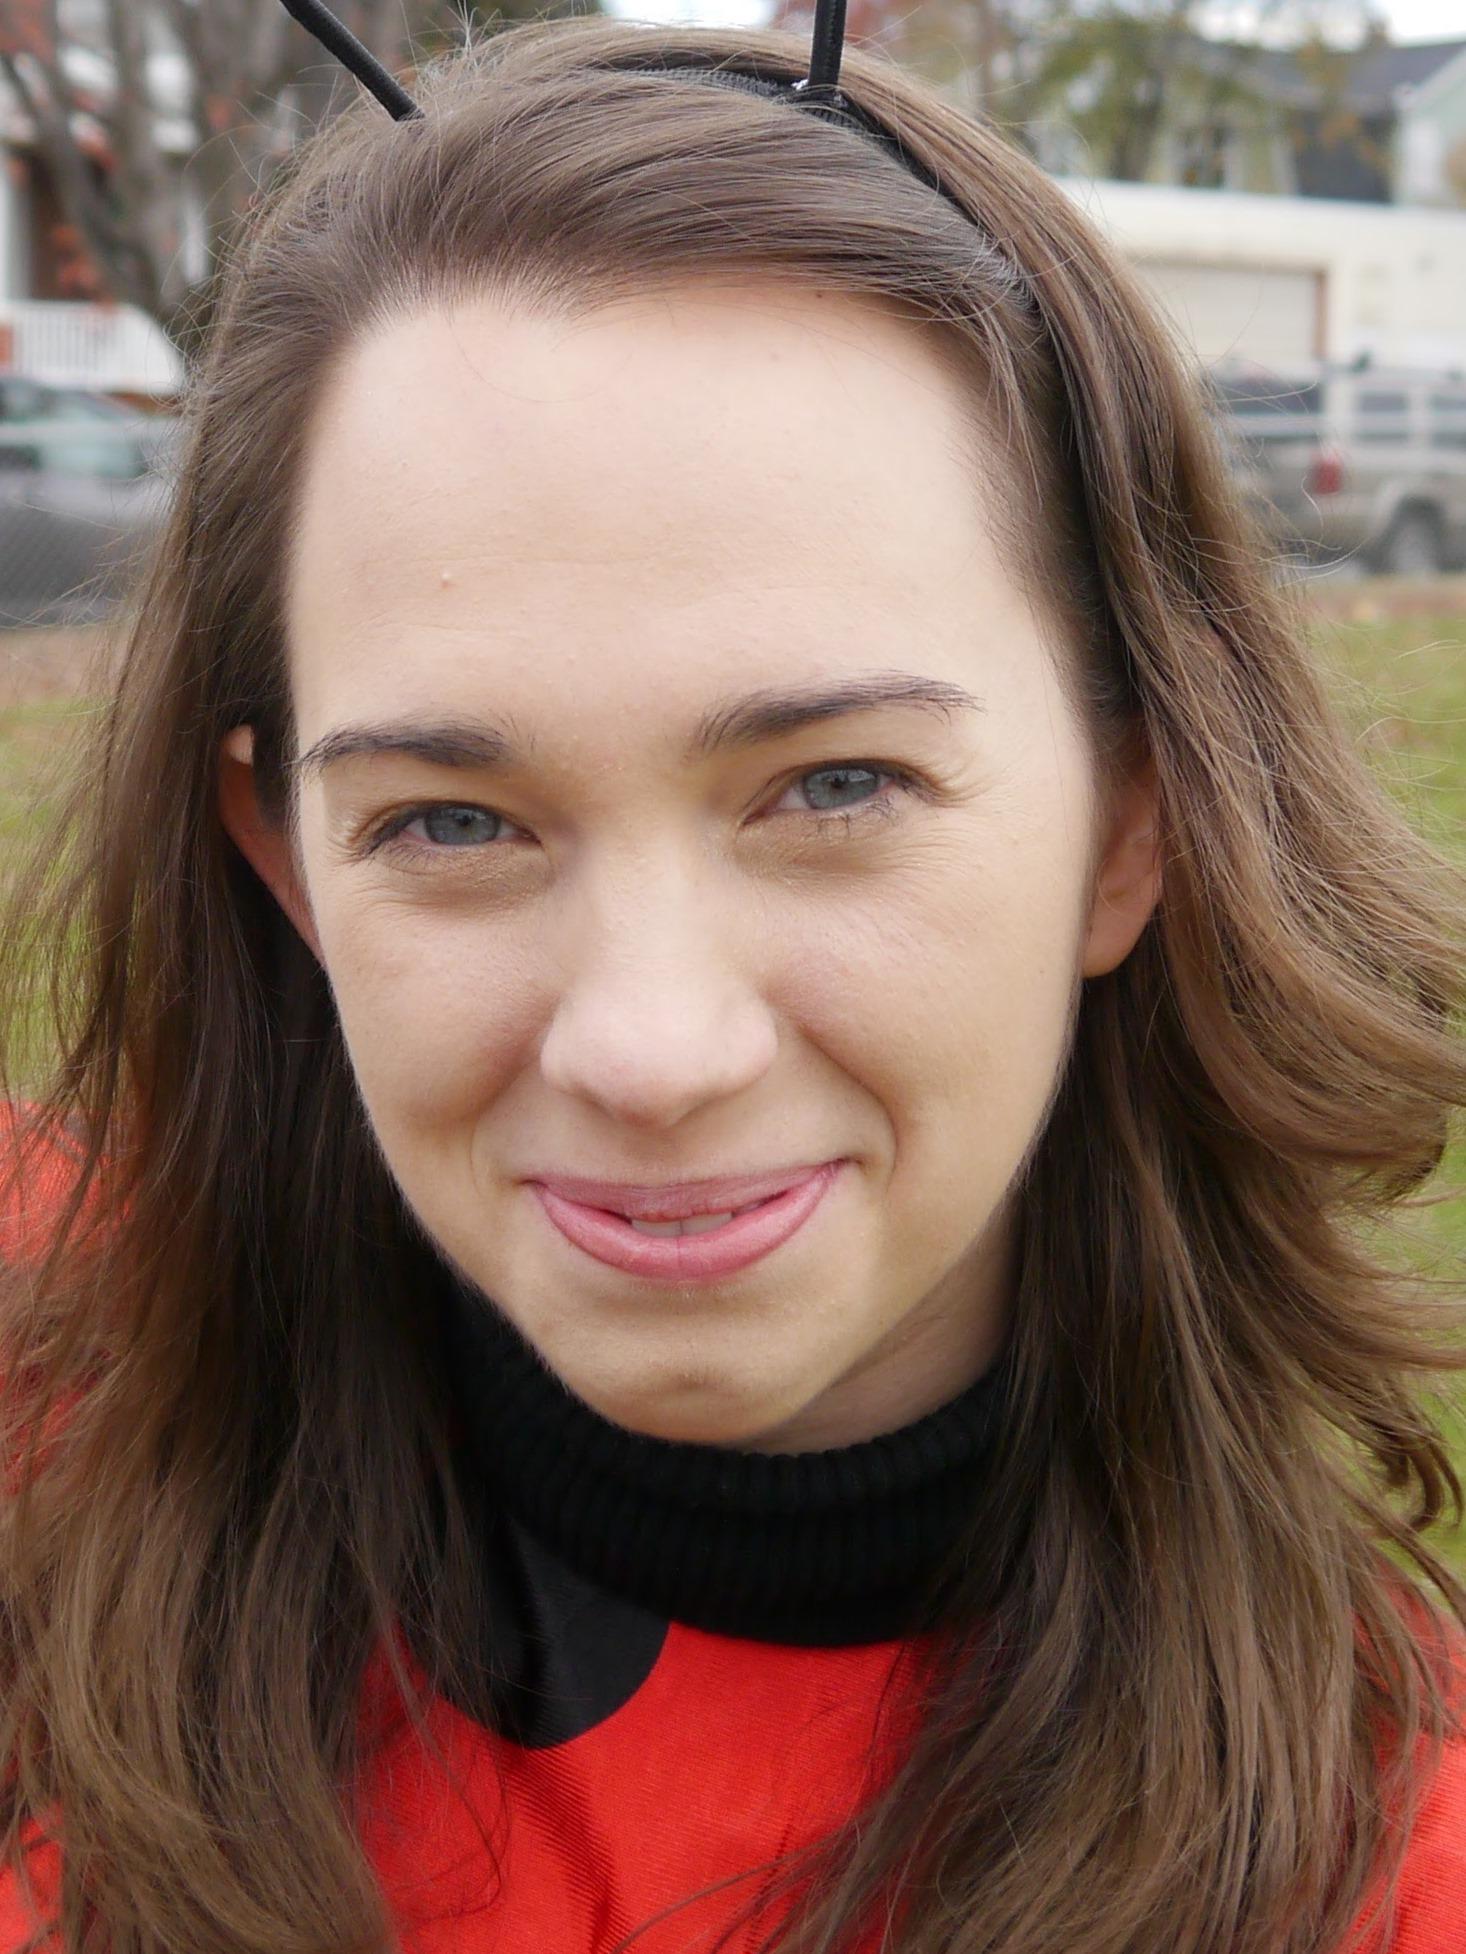 profile photo 2.jpg